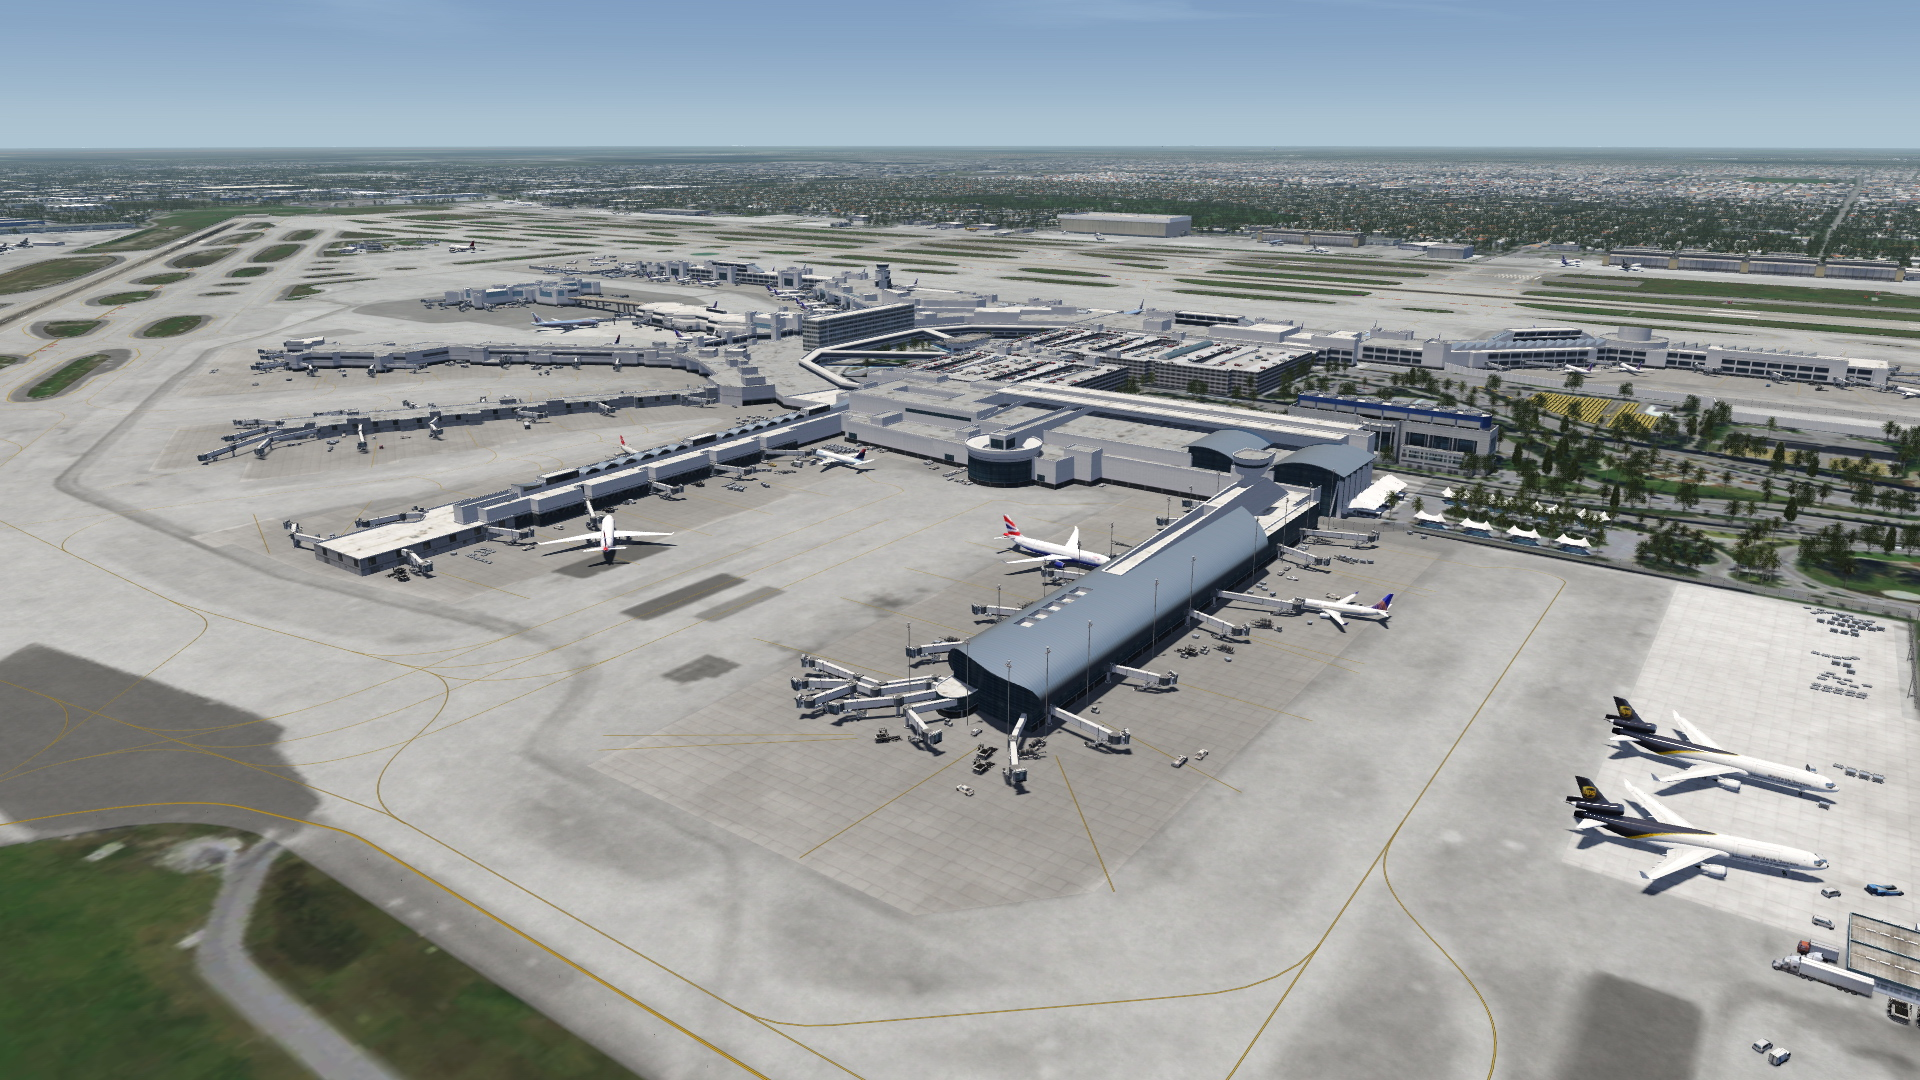 Usa South Florida For Aerofly Fs 2